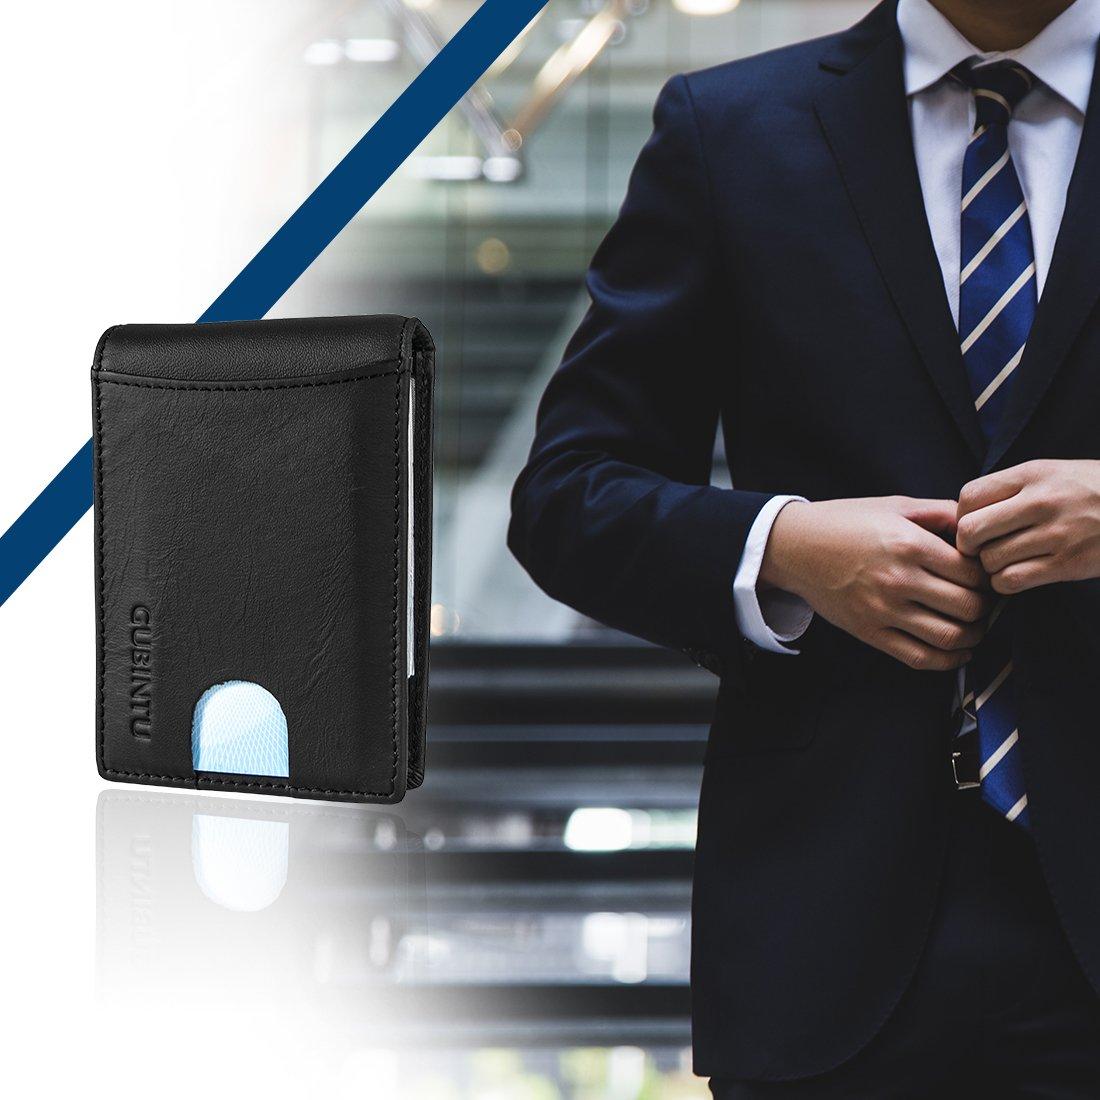 Mens Slim Front Pocket Minimalist RFID Blocking Leather Wallet Card Holder